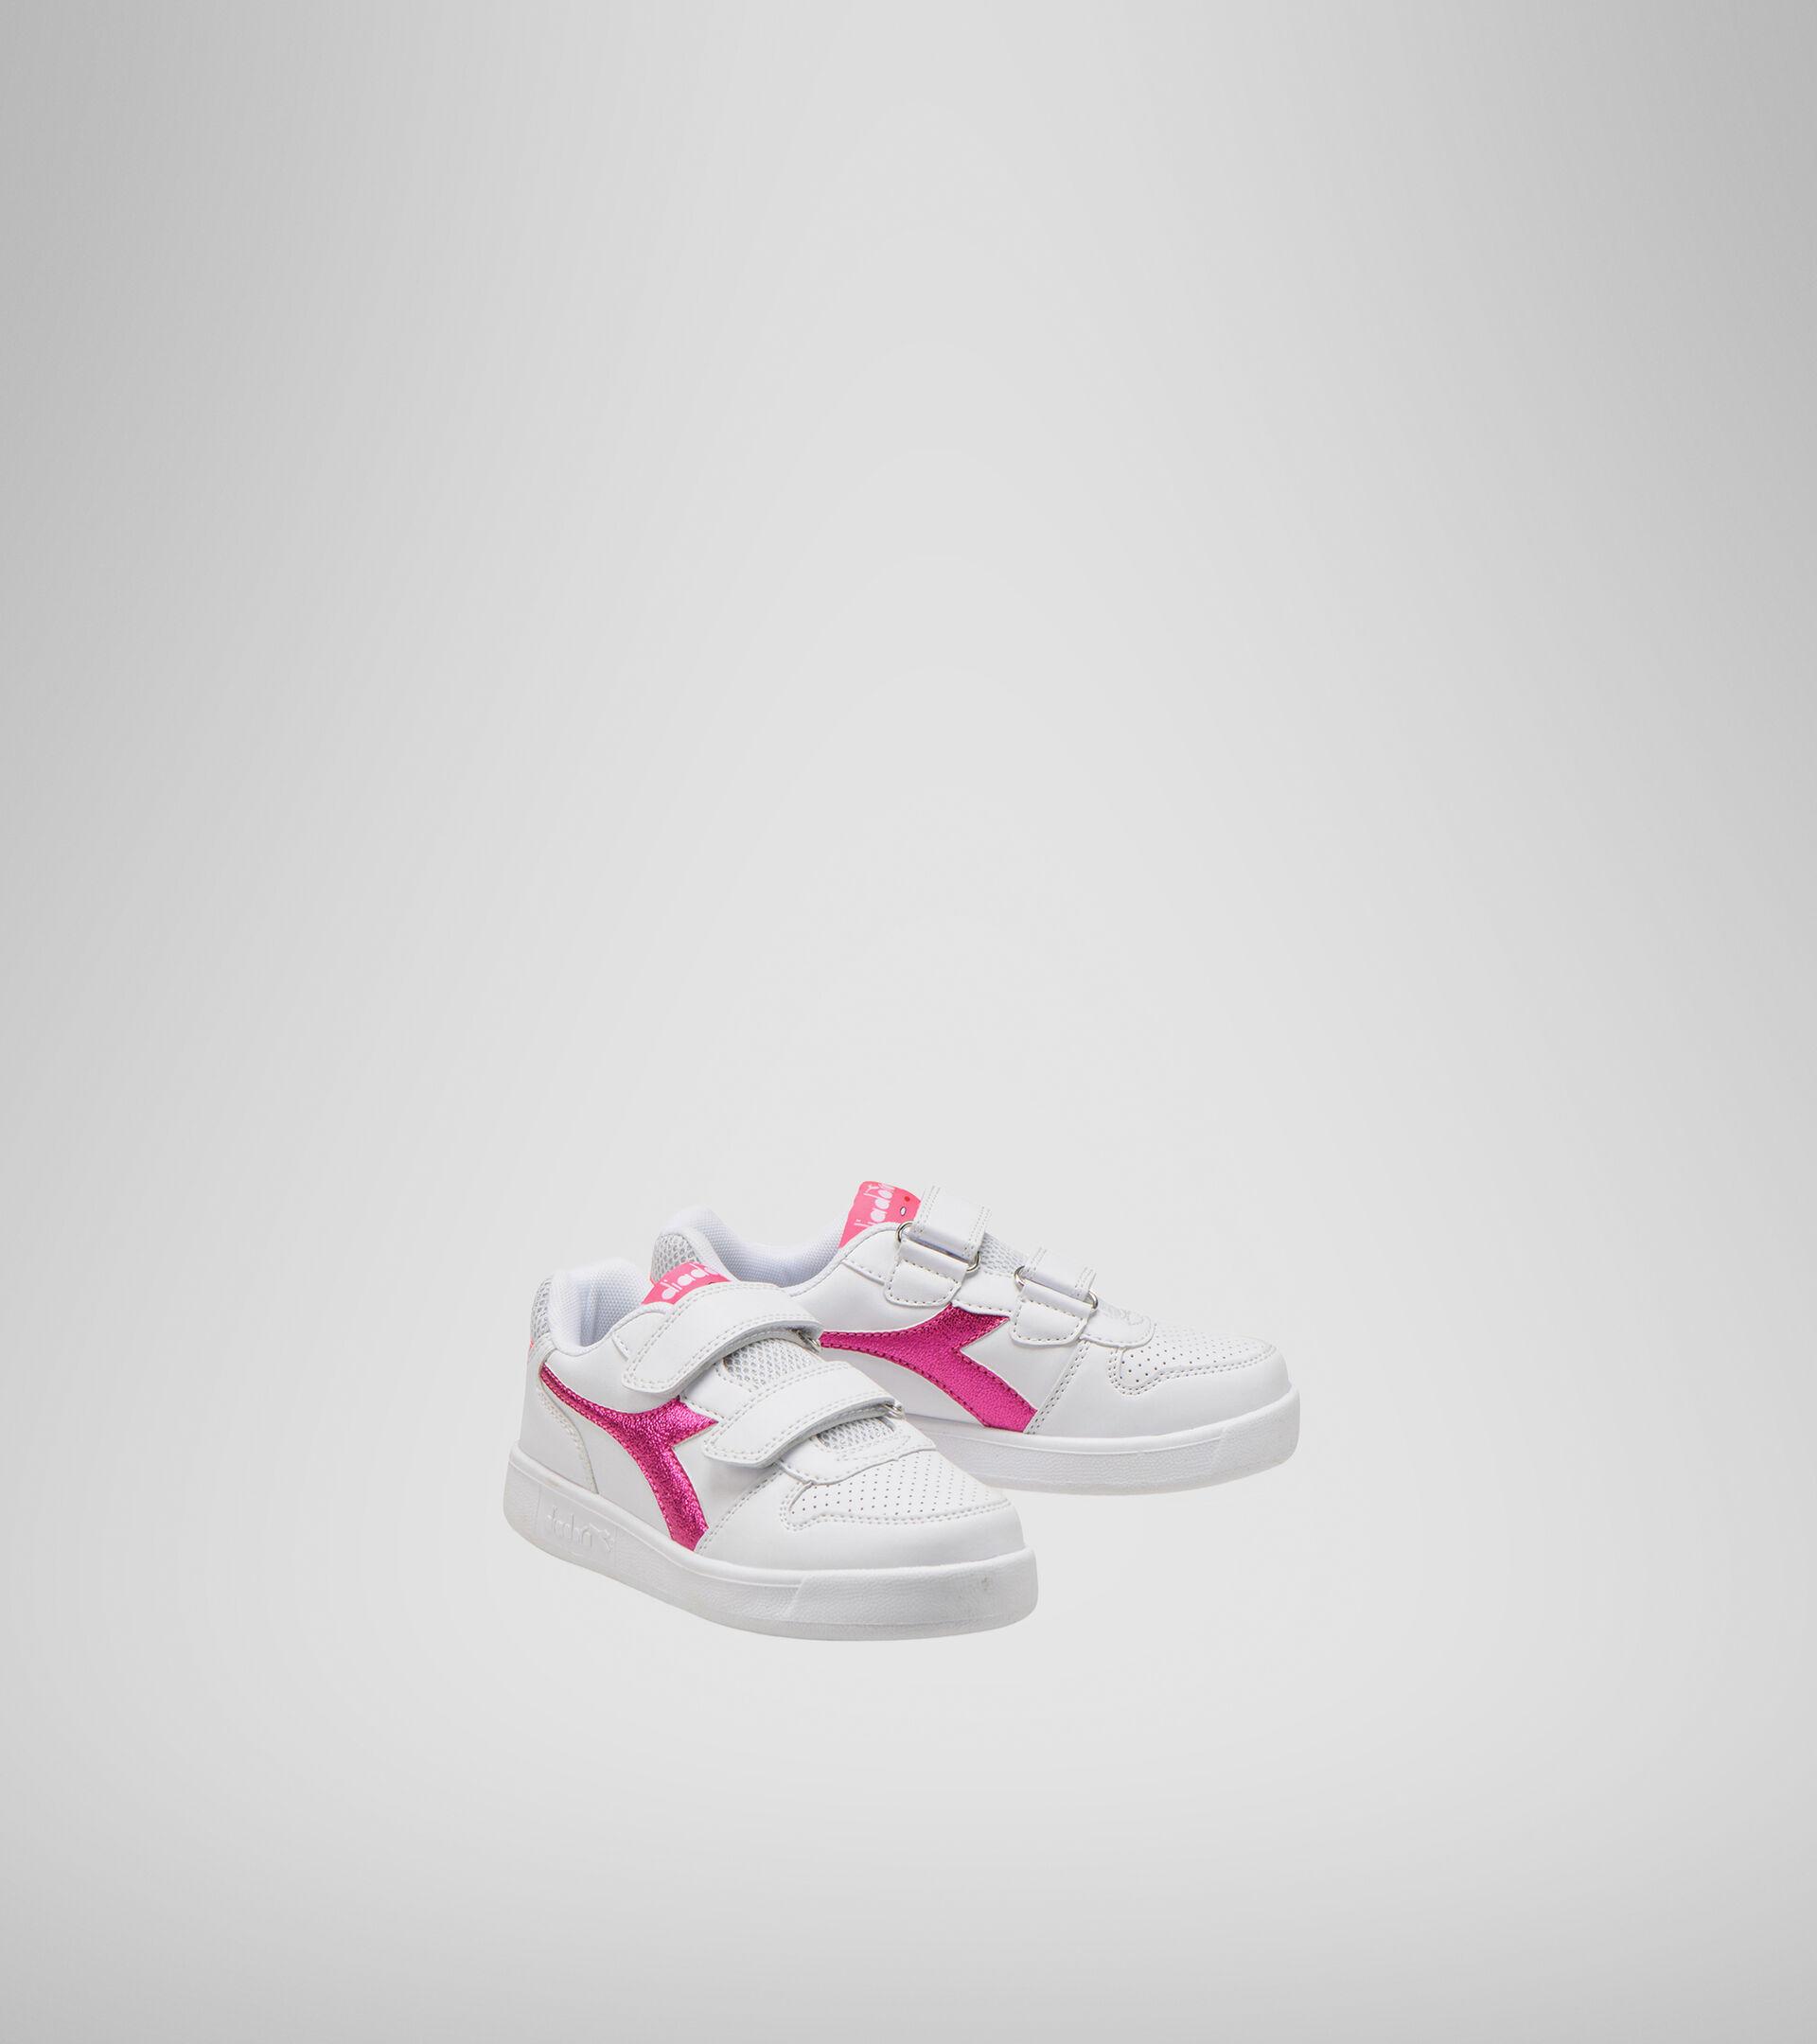 Footwear Sport BAMBINO PLAYGROUND PS GIRL BIANCO/ROSA FLUO Diadora